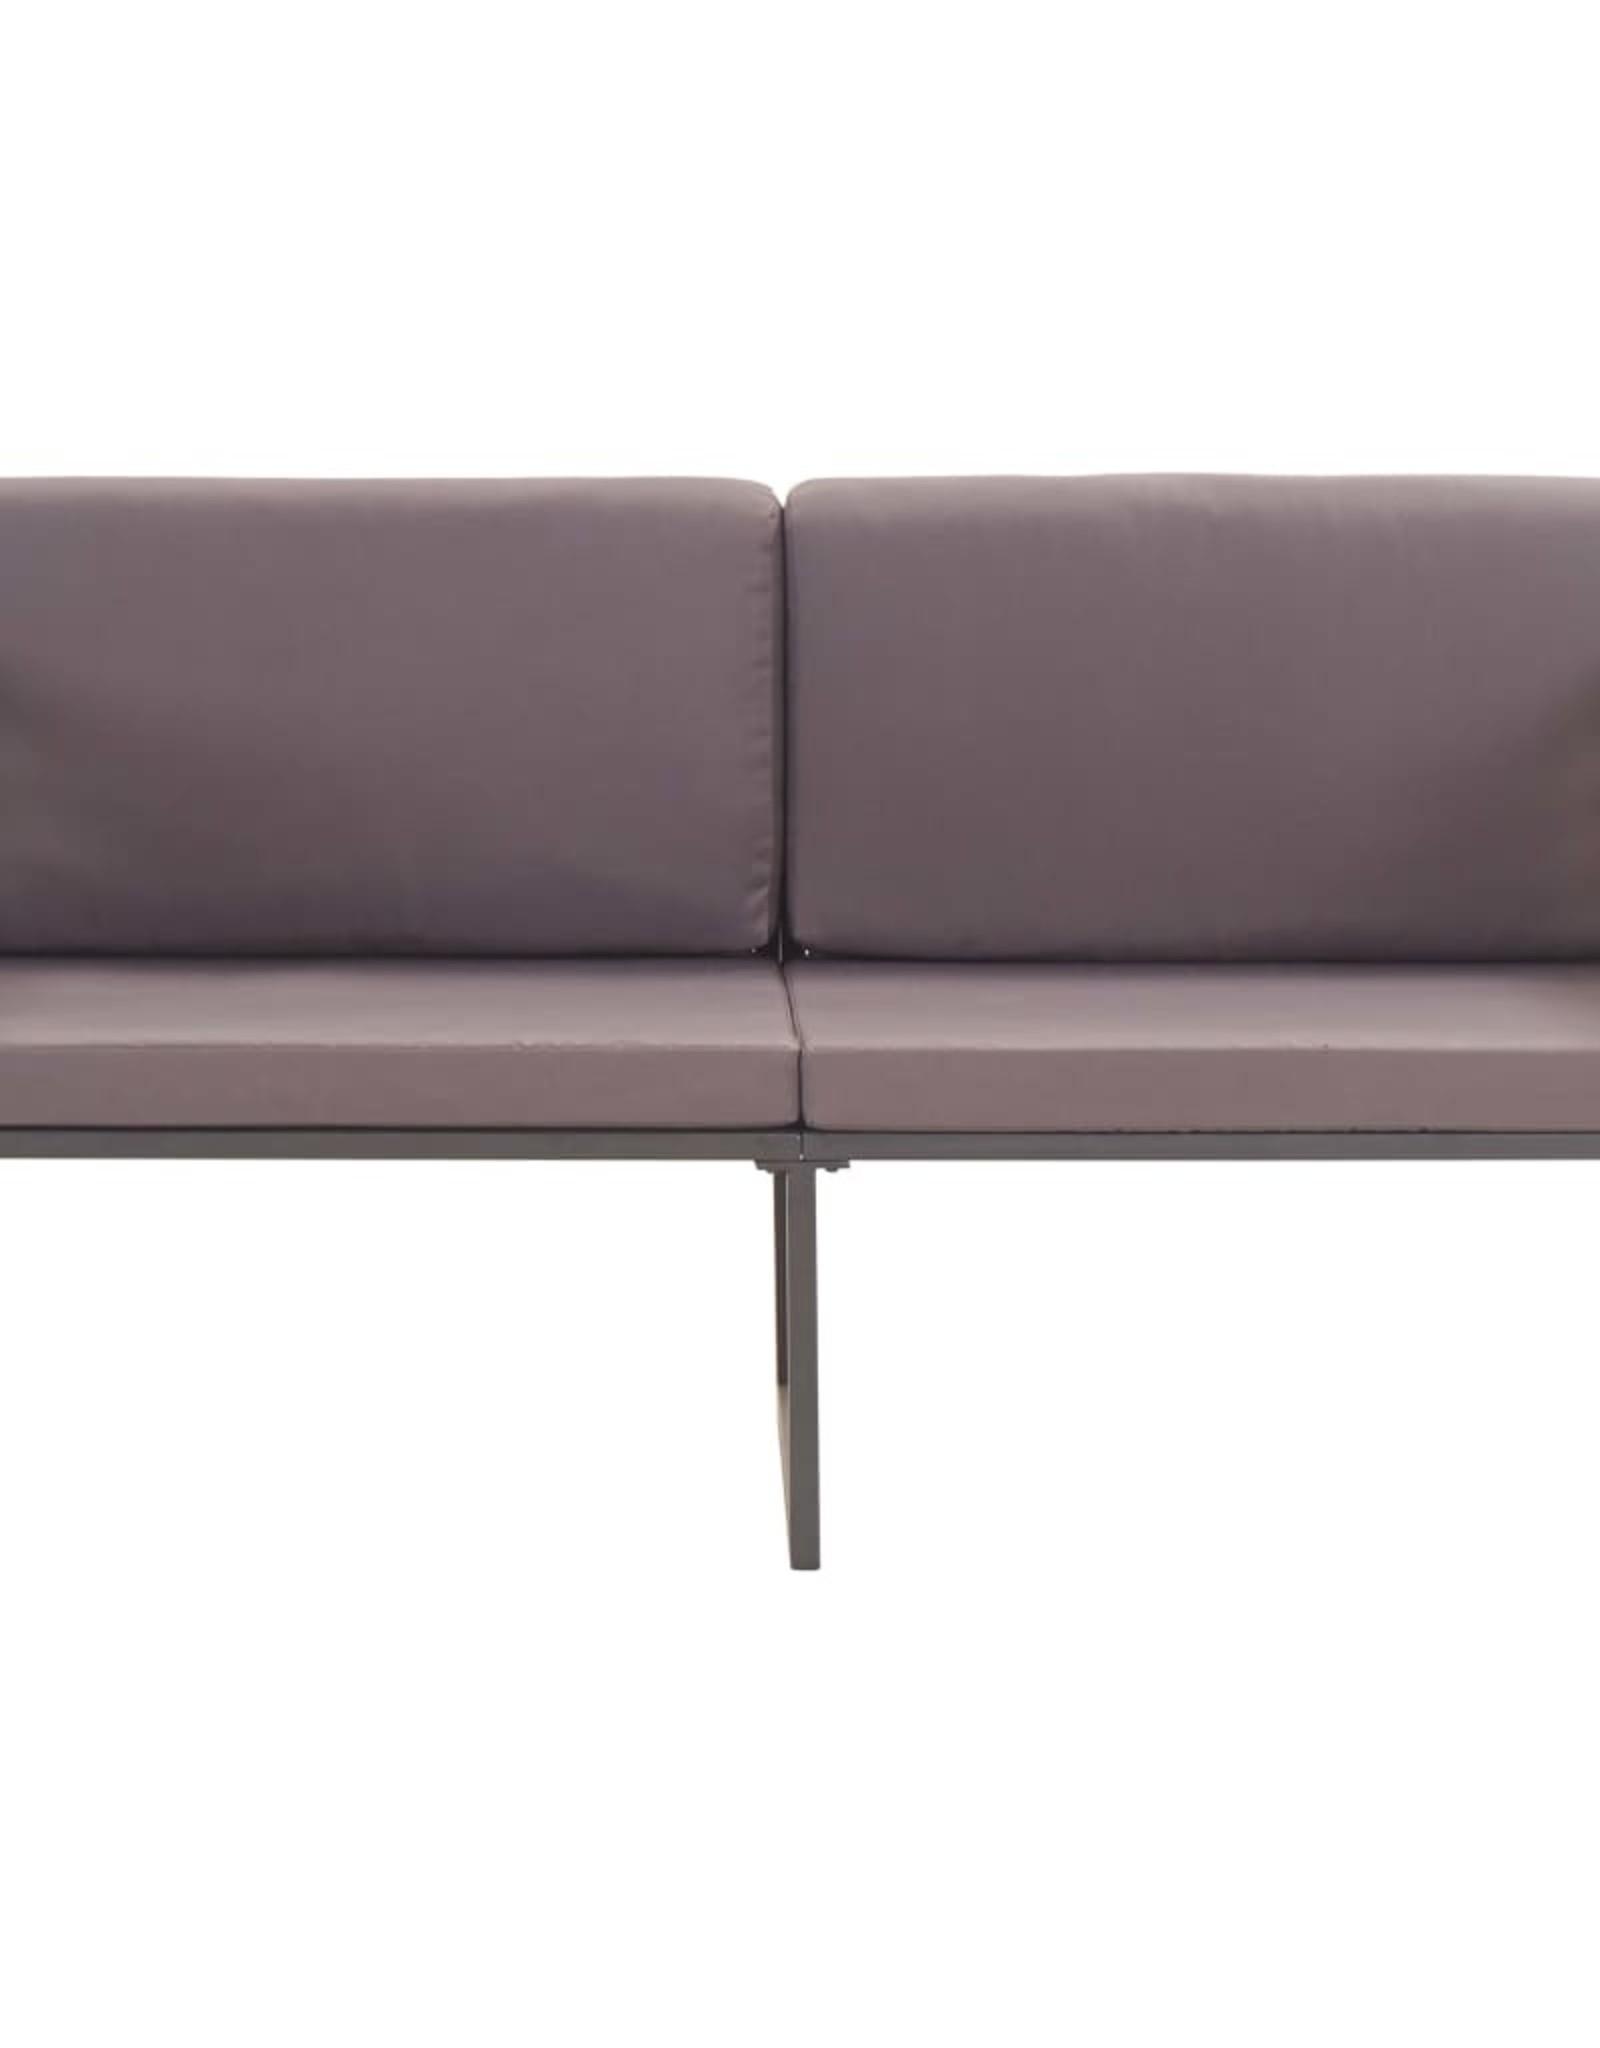 vidaXL 4-delige Loungeset massief acaciahout en staal